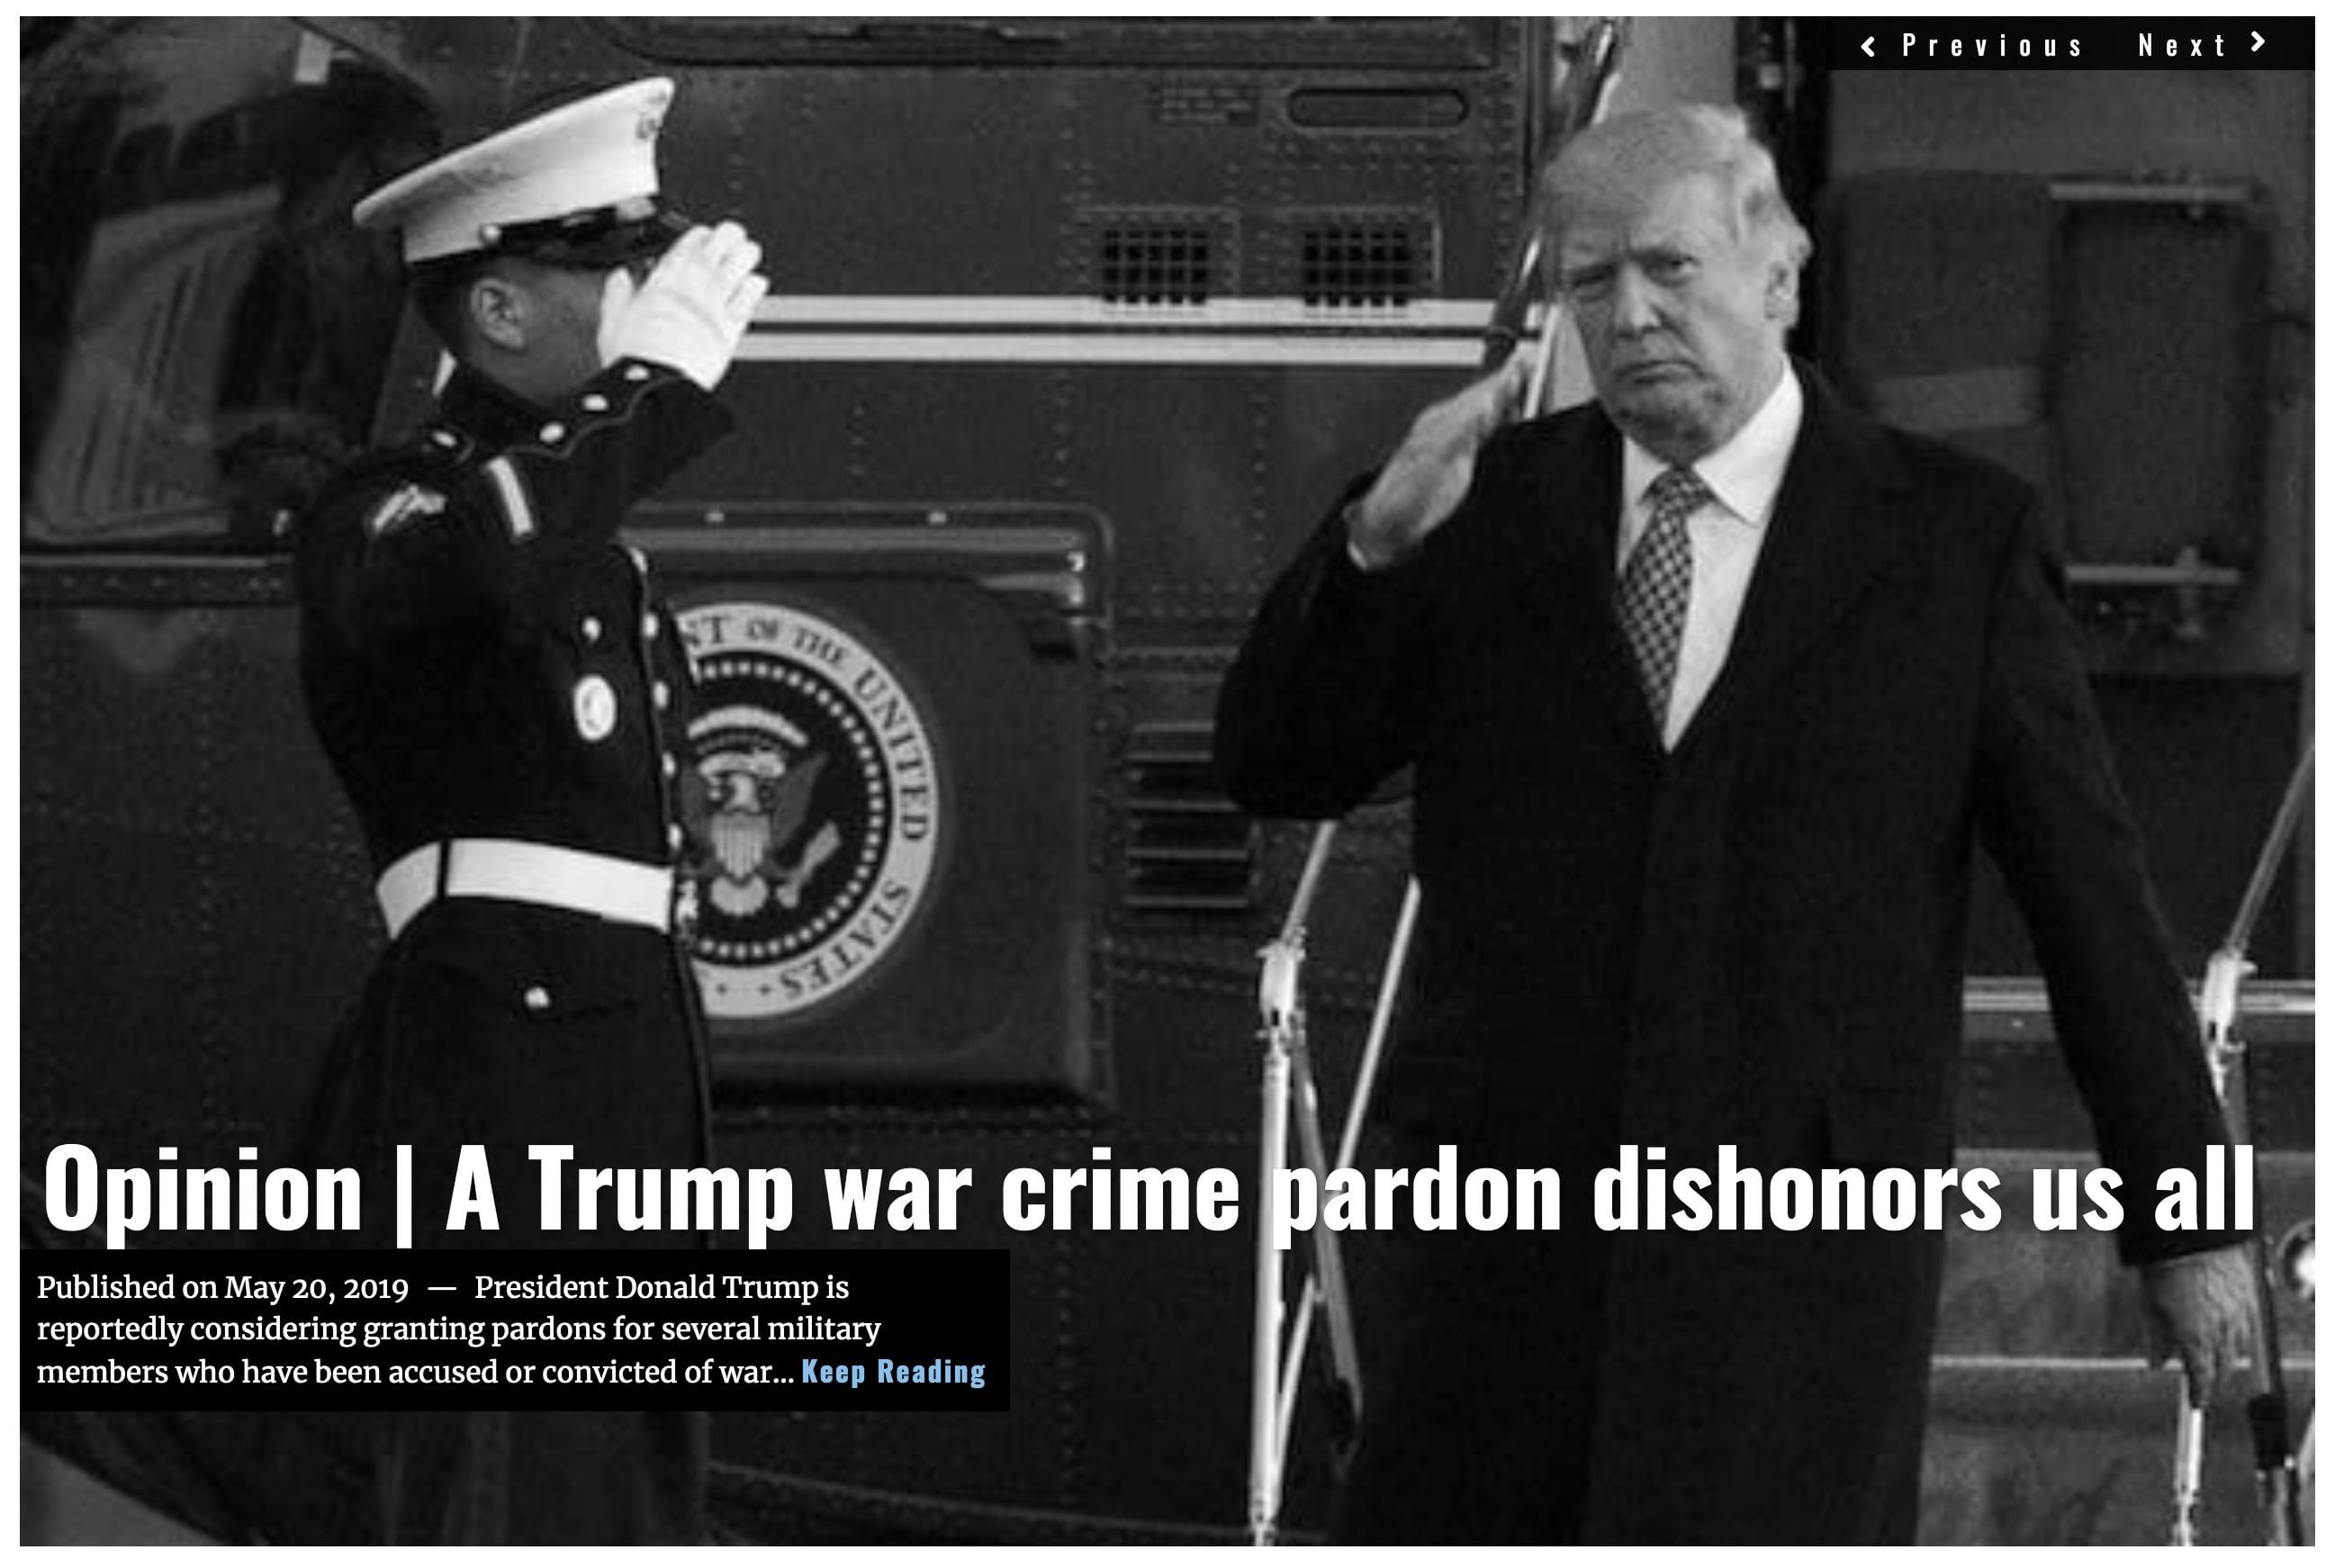 Lima Charlie News Headline Trump War Crime Pardon Dishonors MAY 20 2019